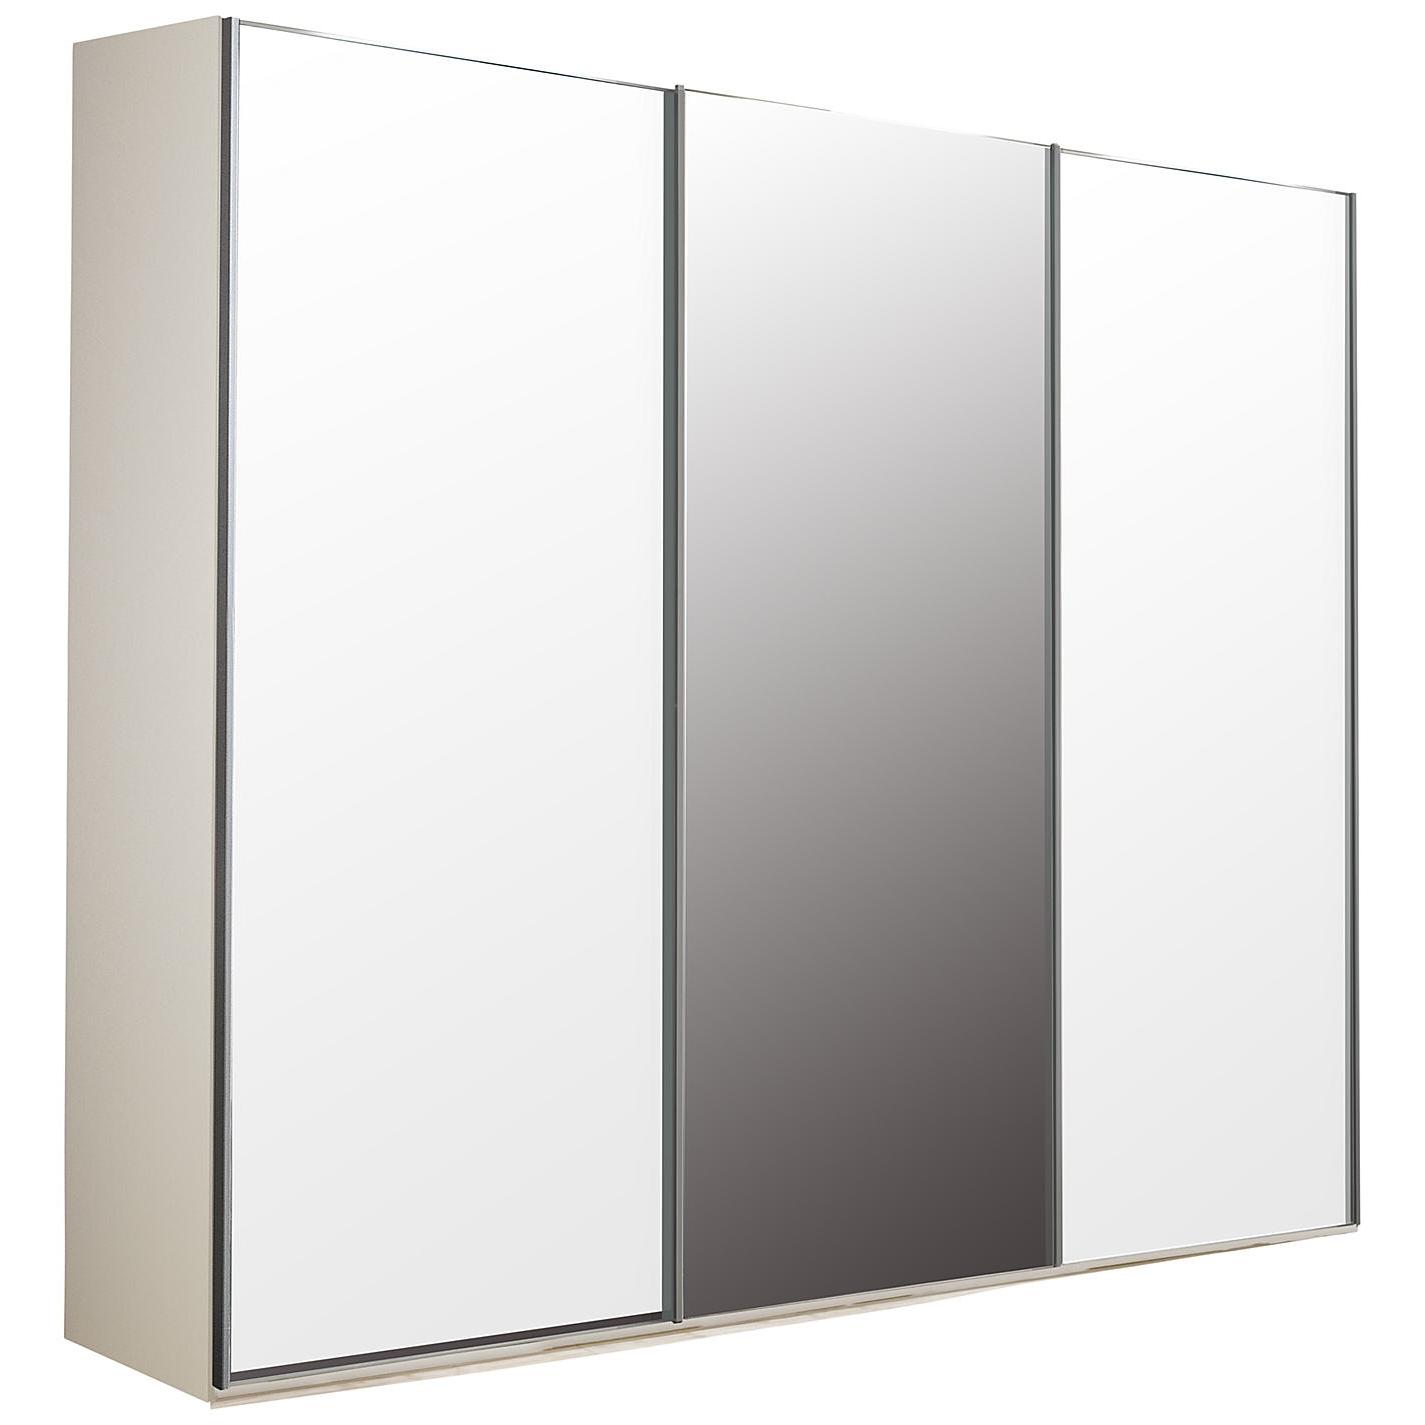 Trendy Cheap Wardrobes With Mirror Regarding Mirror Design Ideas: John Lewis Mirror Wardrobes Sliding Doors (View 12 of 15)